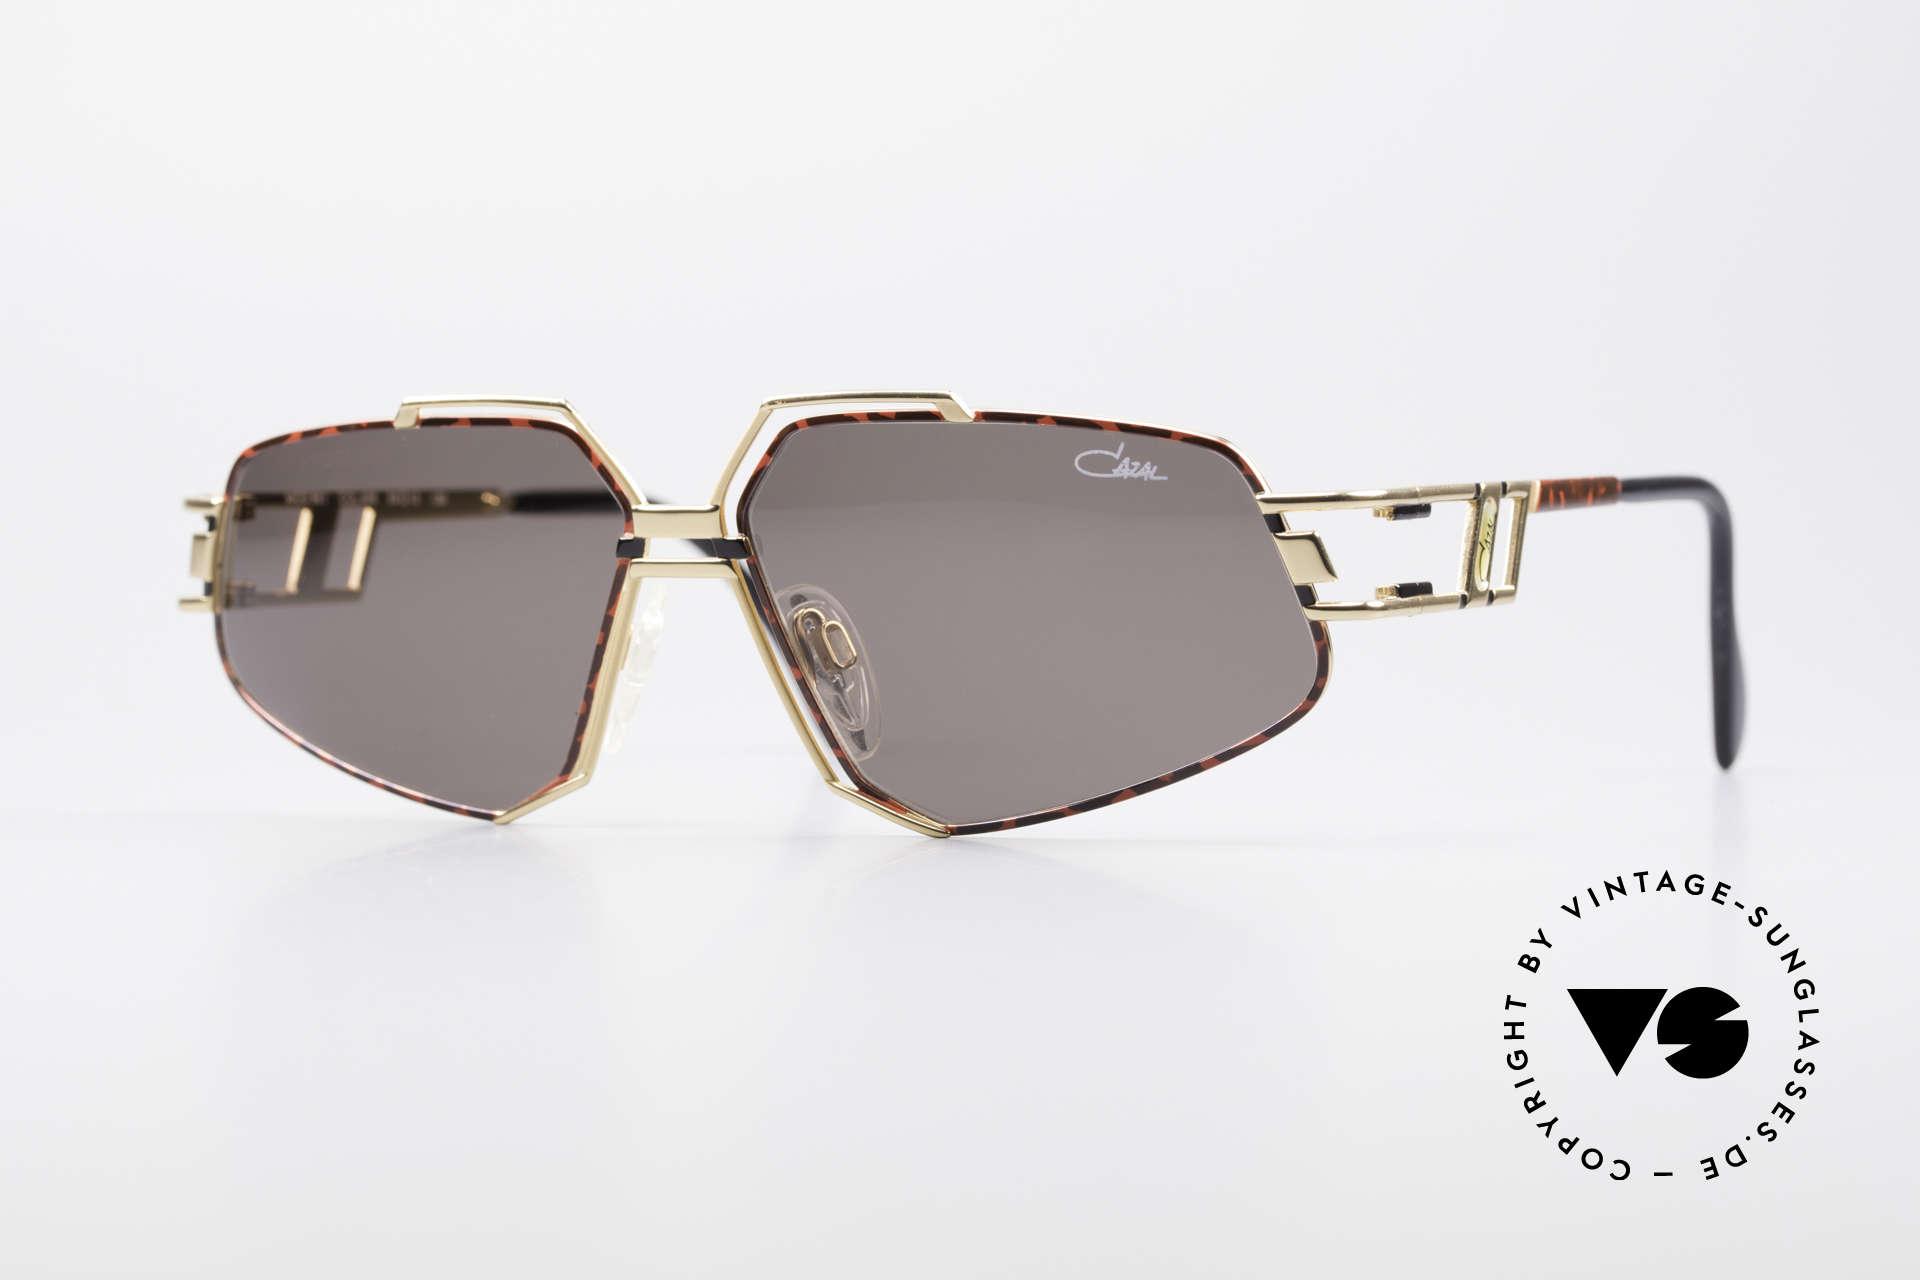 Cazal 961 Designer Vintage Sunglasses, extraordinary CAZAL vintage sunglasses from 1991/92, Made for Men and Women